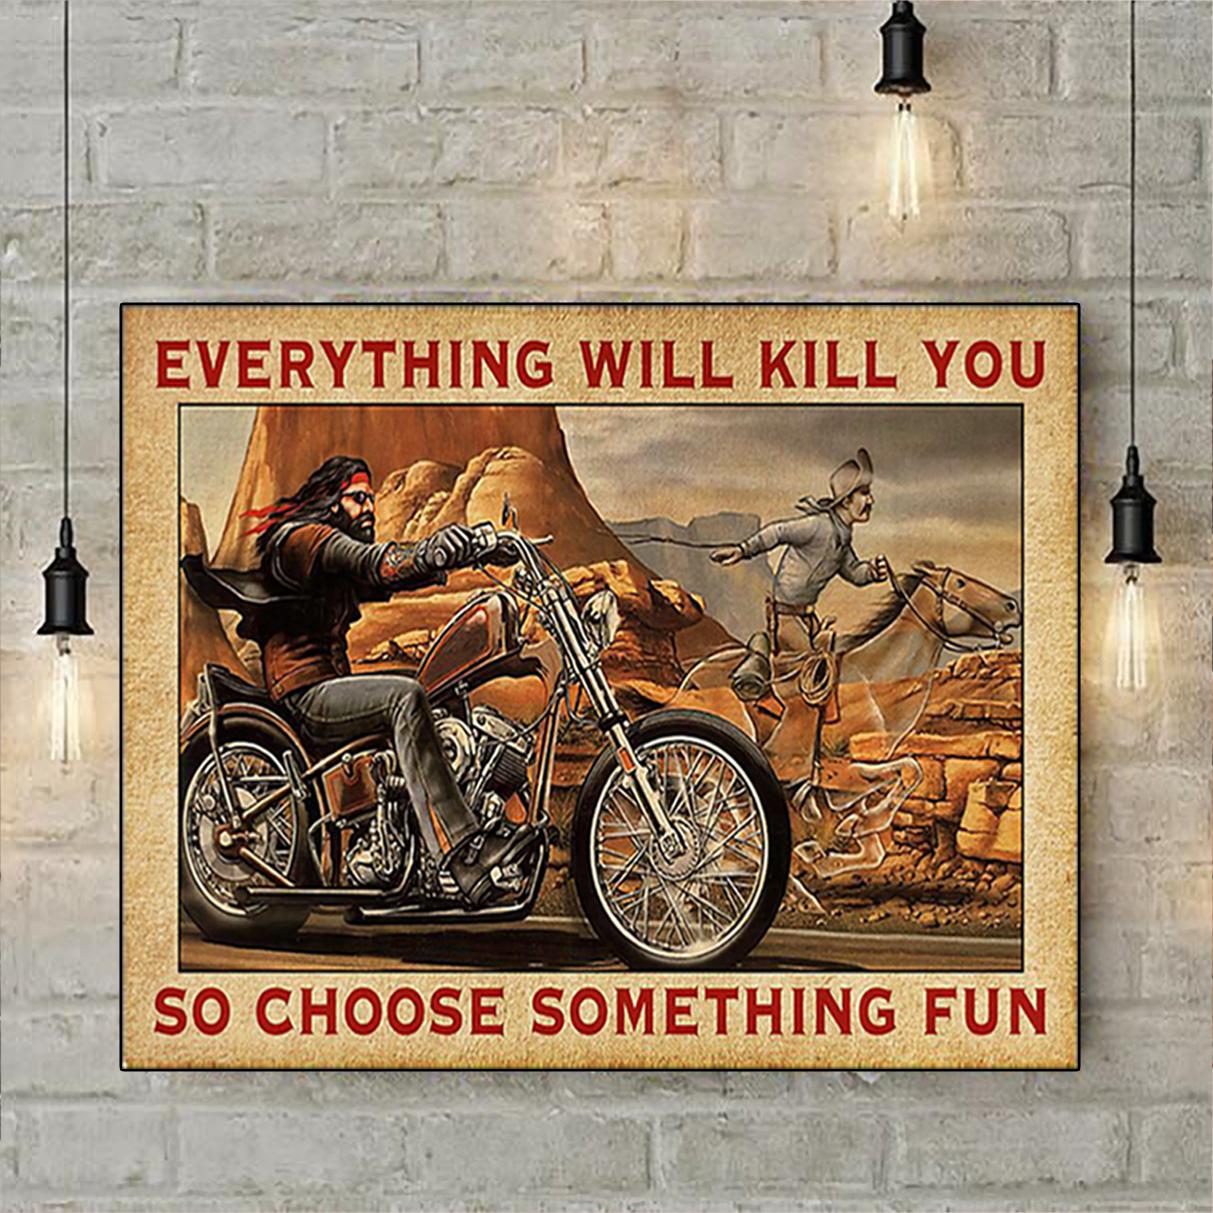 Biker cowboy everything will kill you so choose something fun poster A2